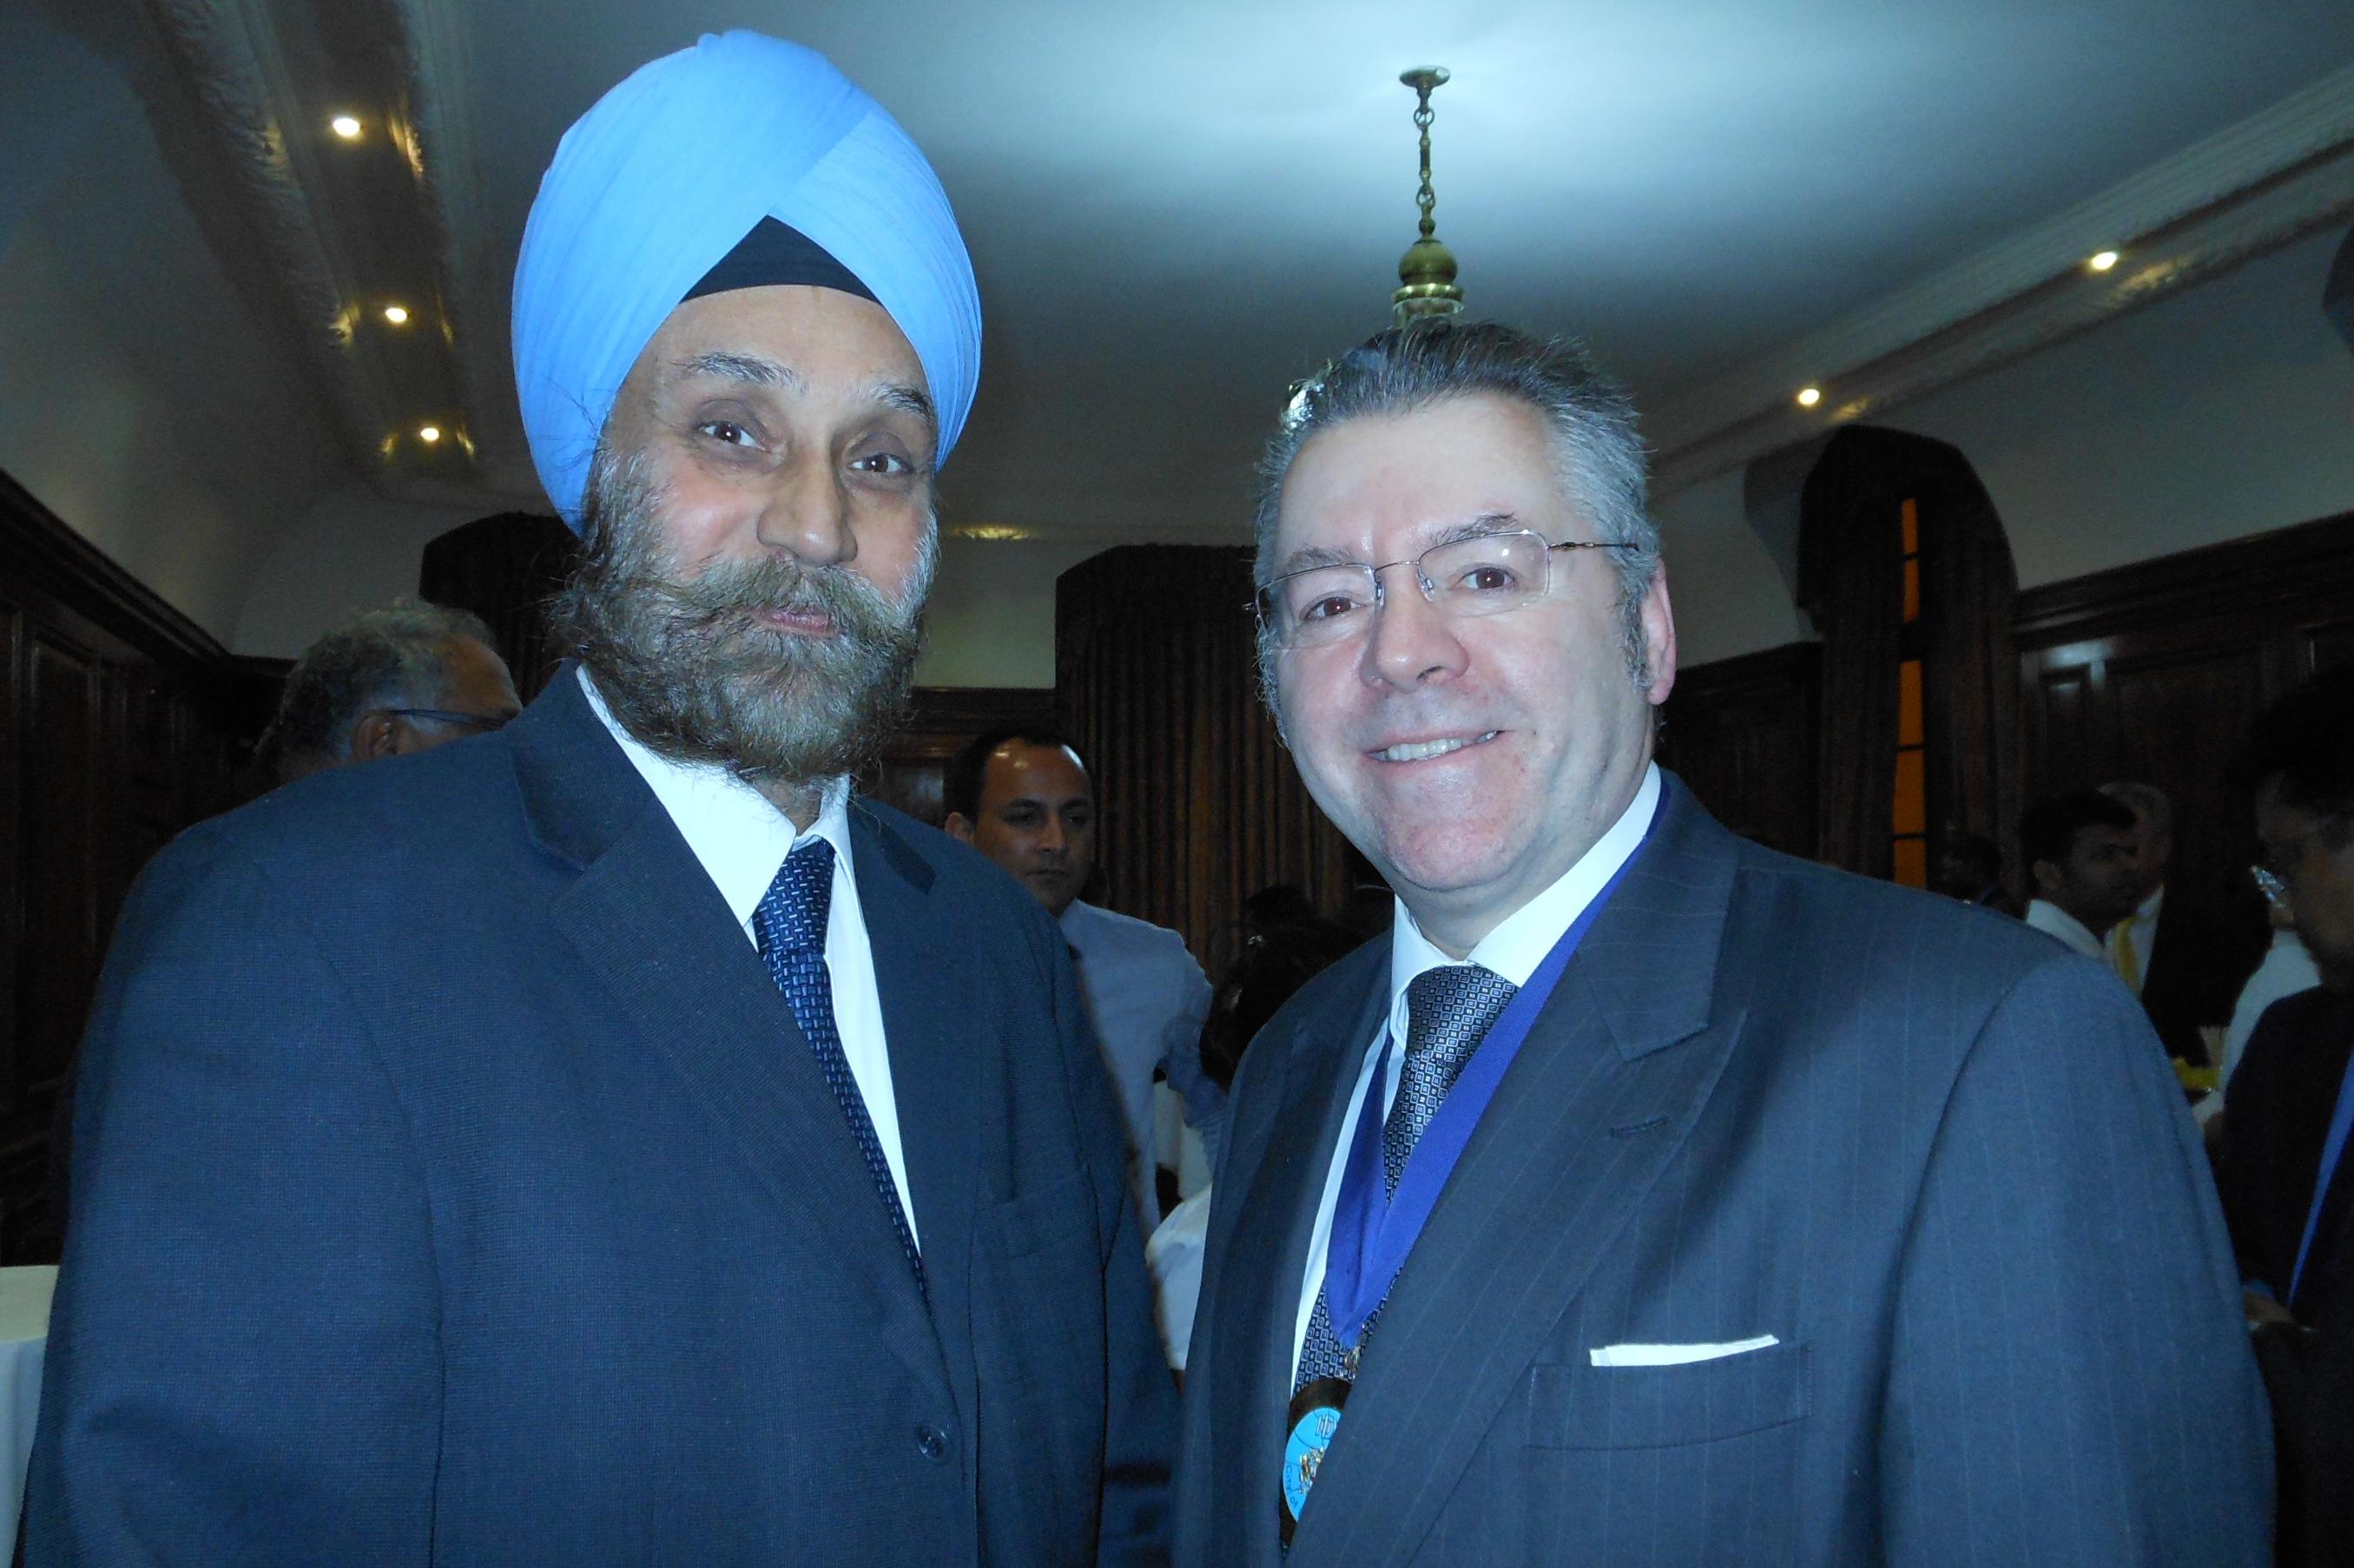 HE Navtej Singh Sarna, High Commissioner of India & David Stringer-Lamarre